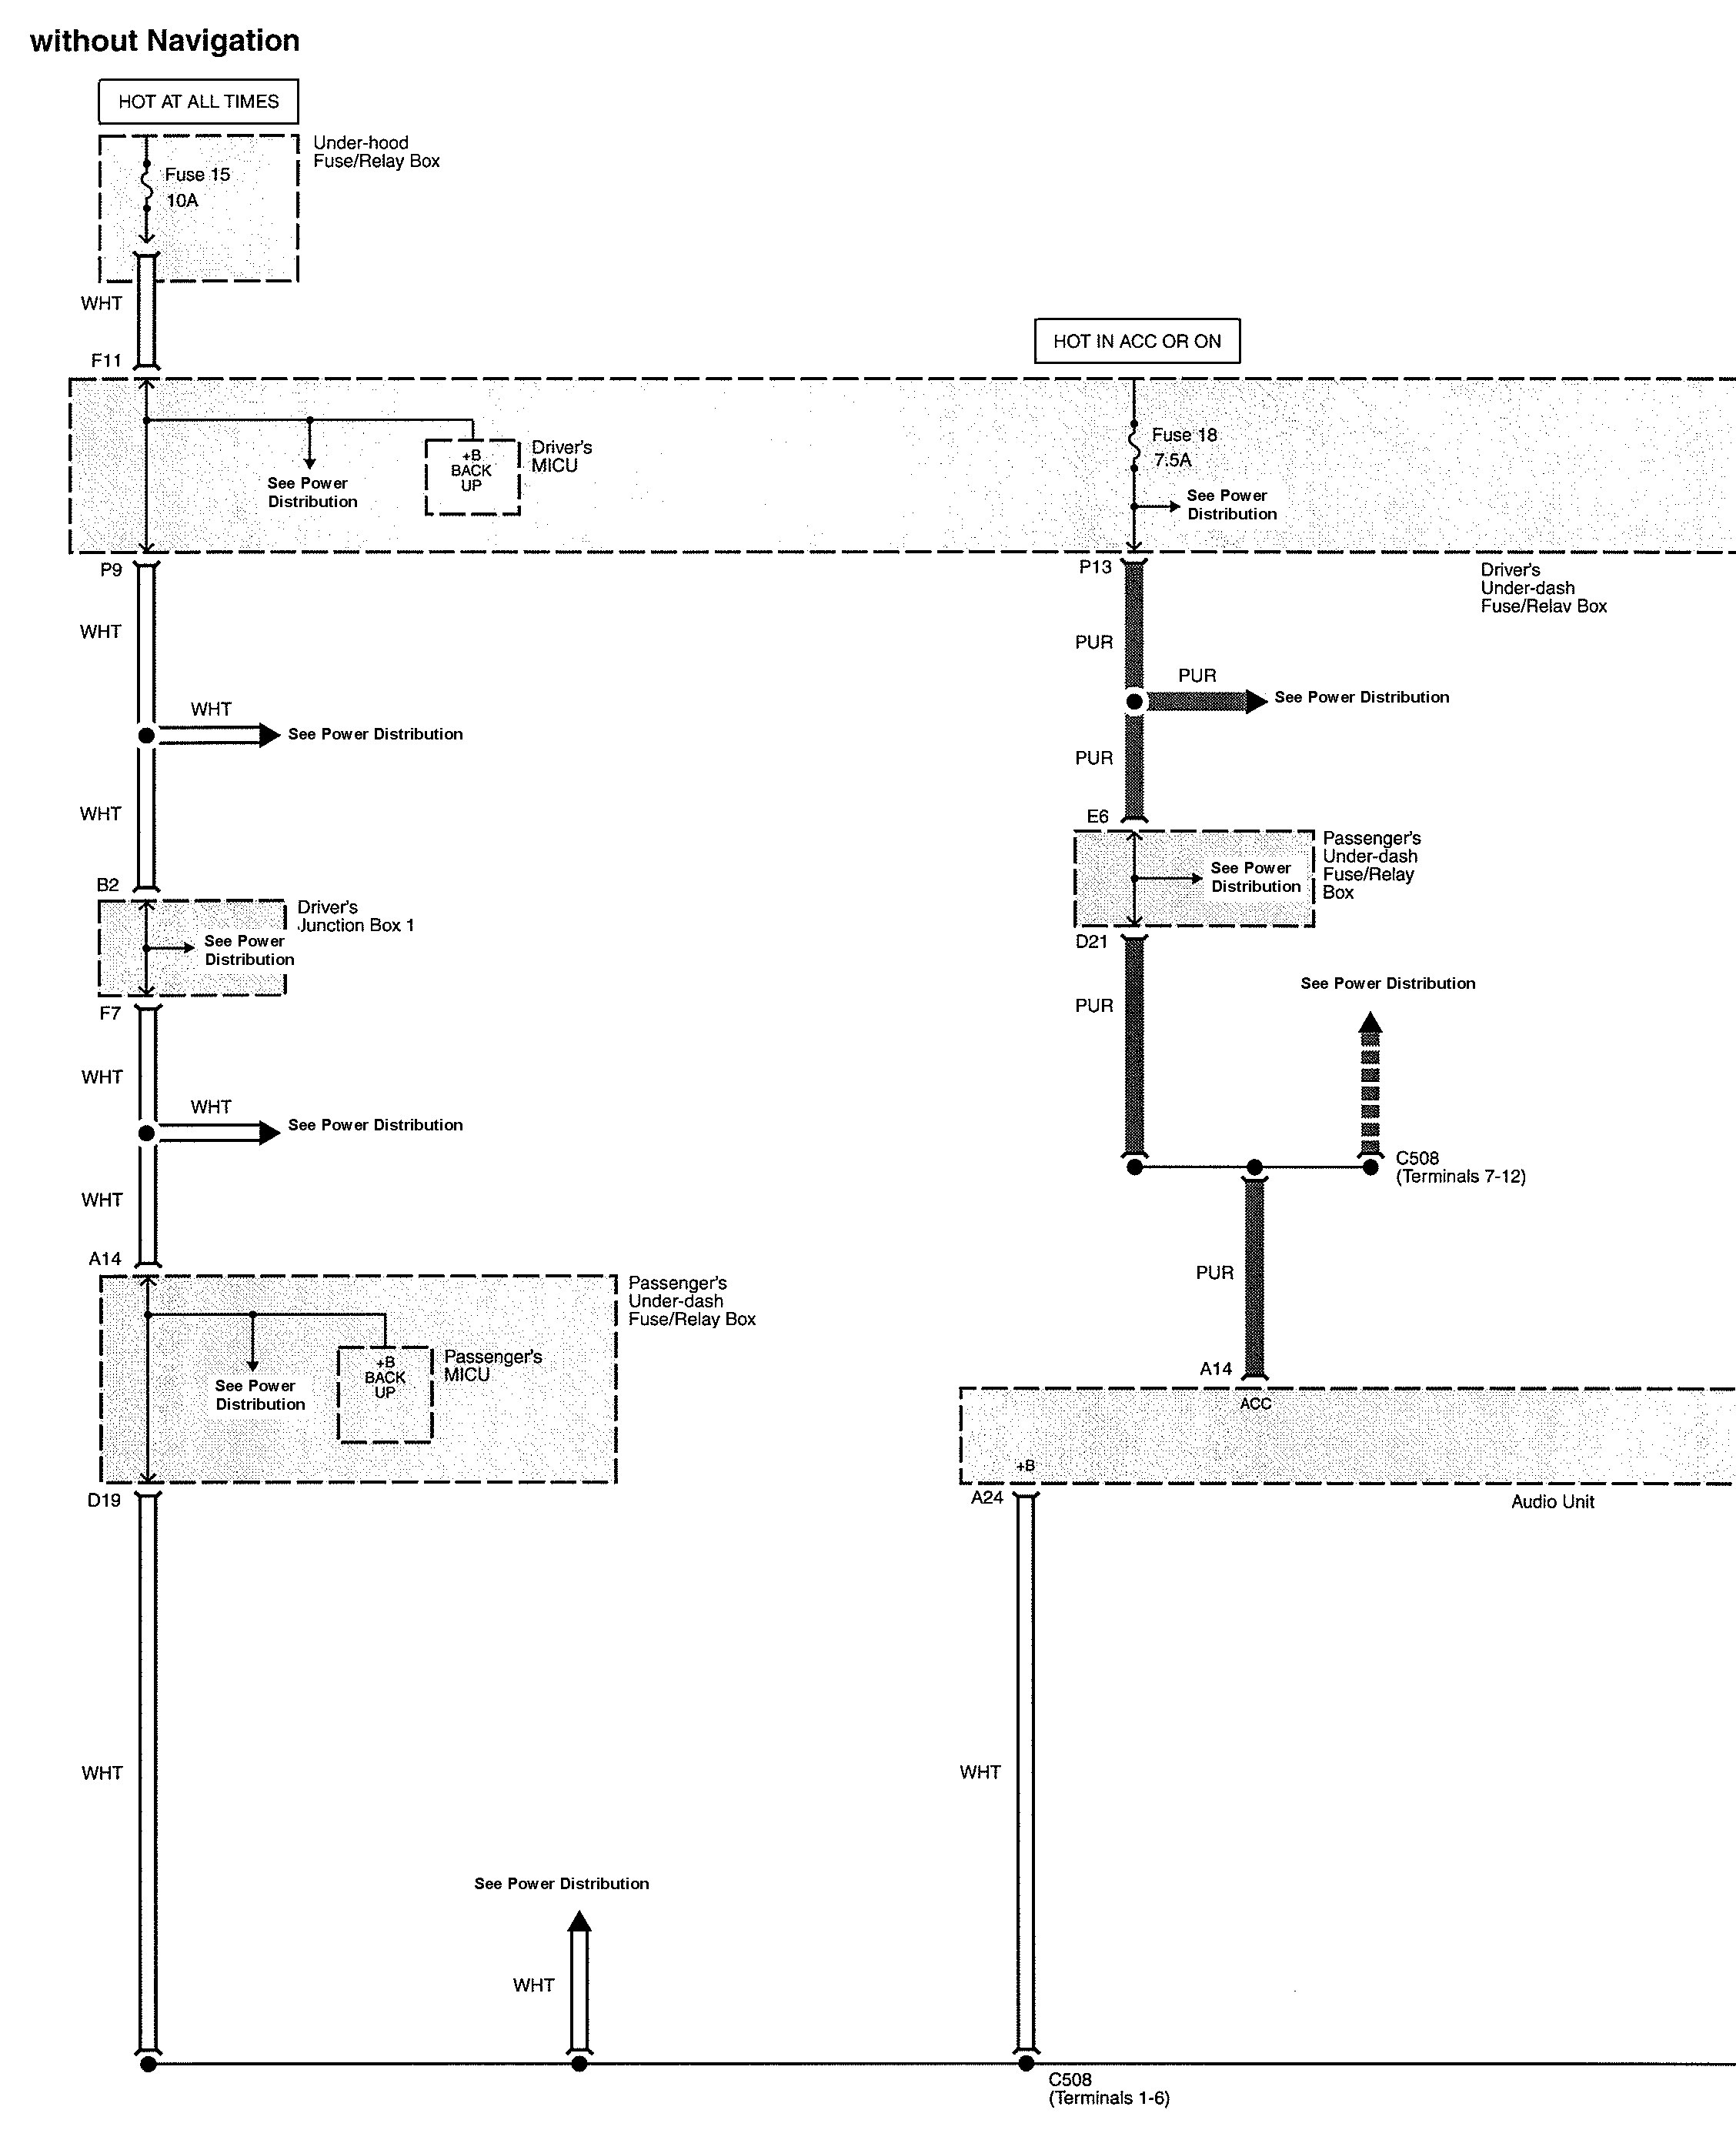 Acura TL (2010) - wiring diagrams - audio - Carknowledge.info   Acura Tl 2010 Wiring Diagram      Carknowledge.info